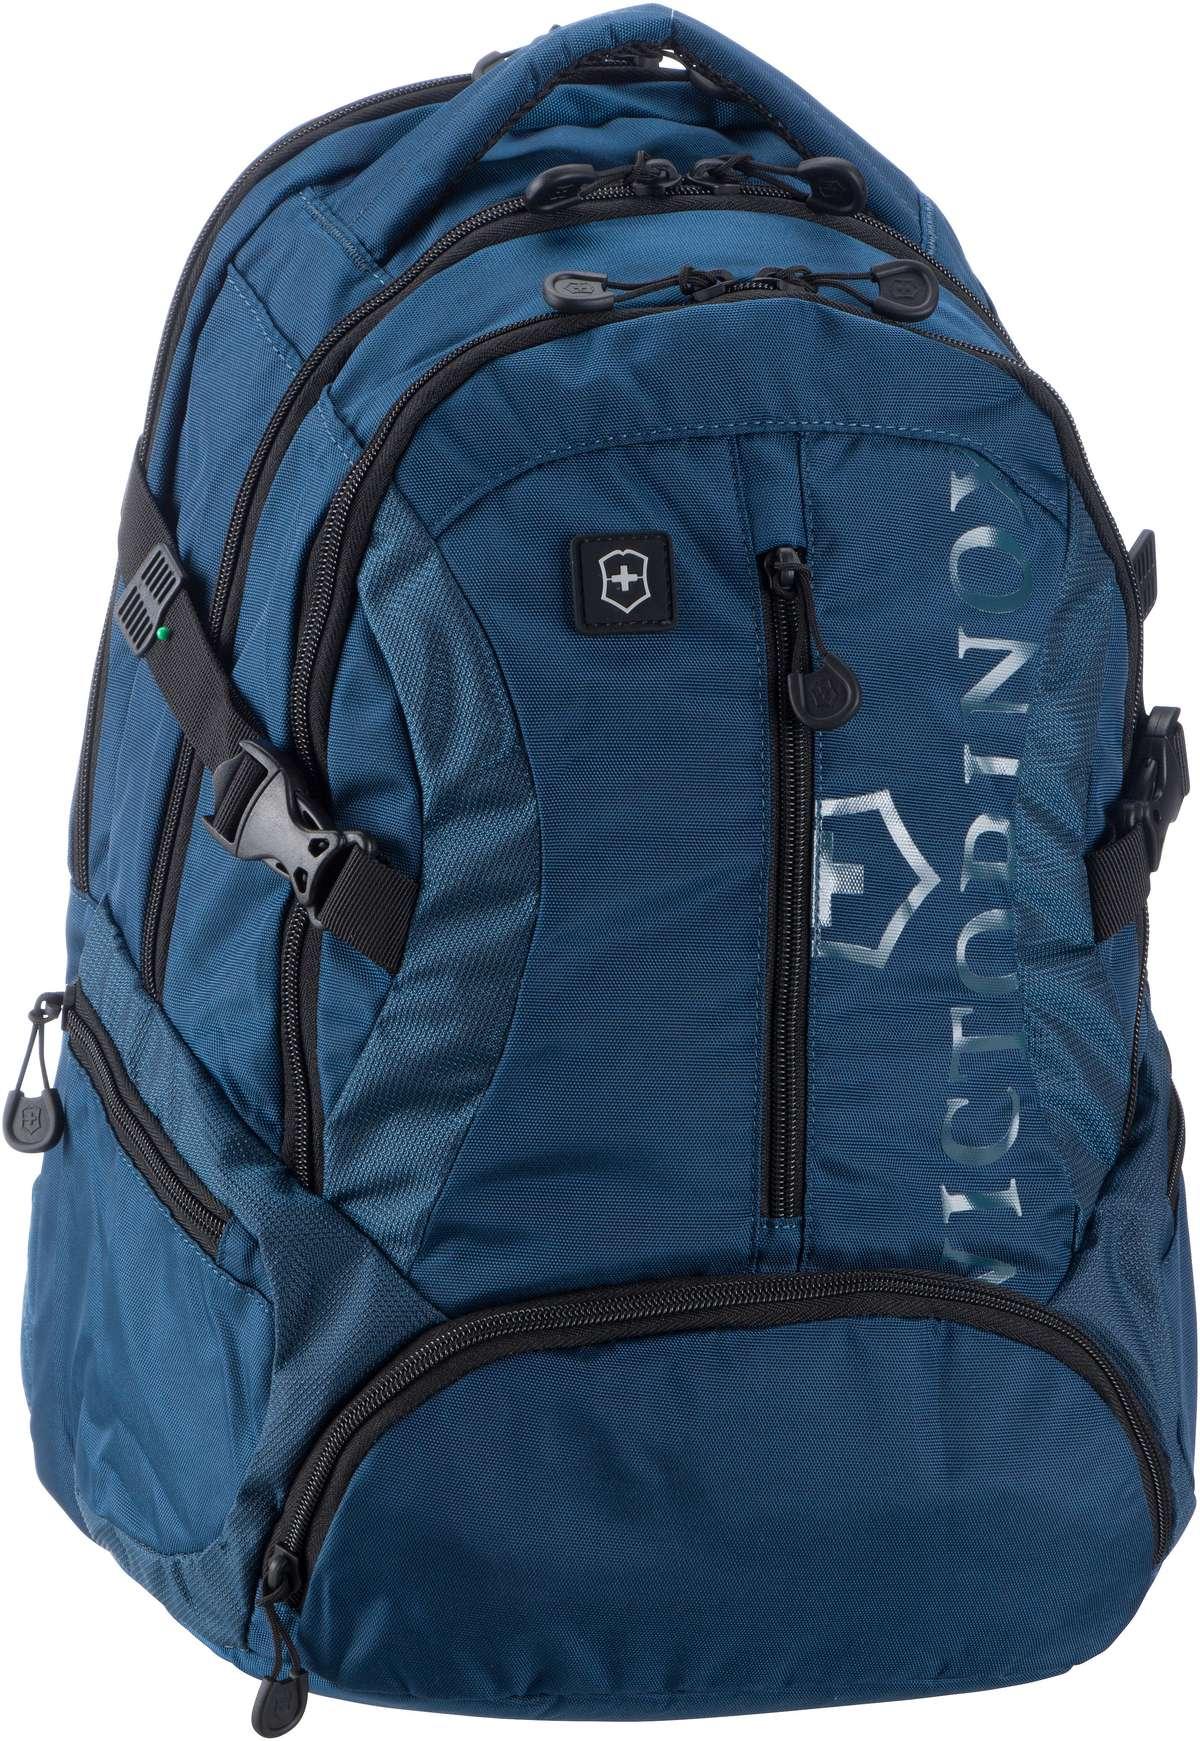 Laptoprucksack Vx Sport Scout Blue (26 Liter)